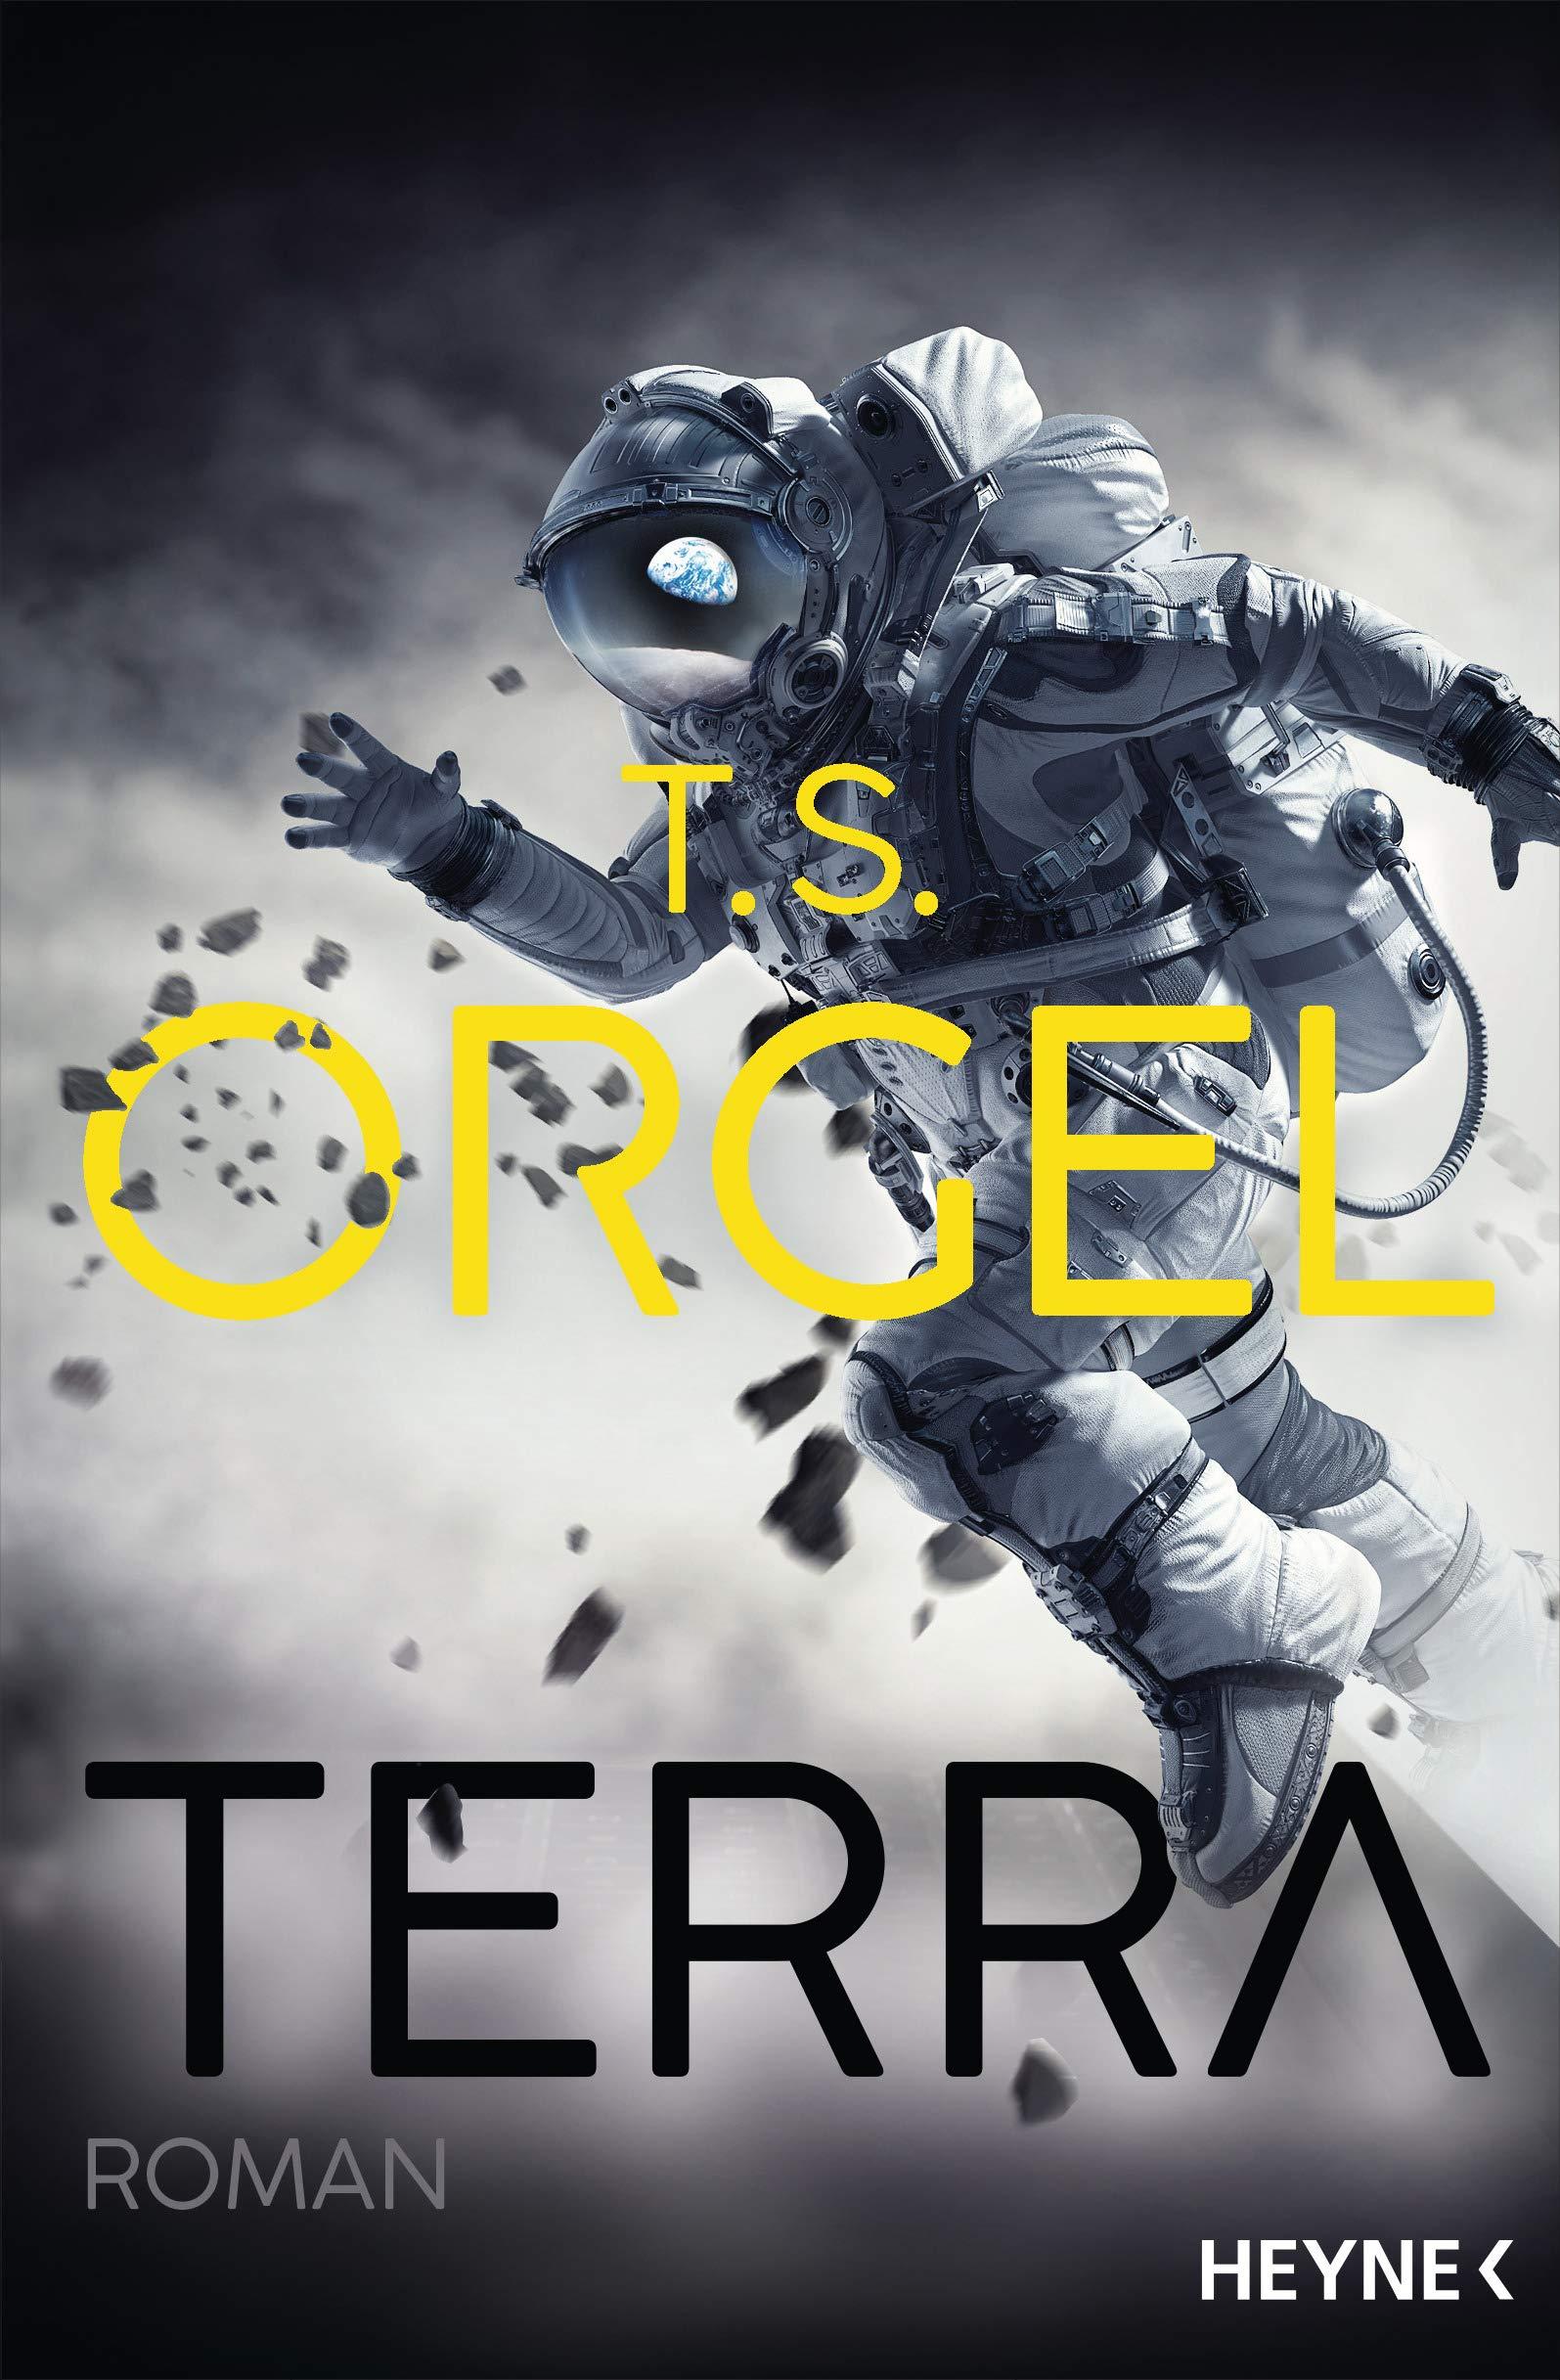 Orgel_TS_Terra_Phantastik-Autoren-Netzwerk.jpg